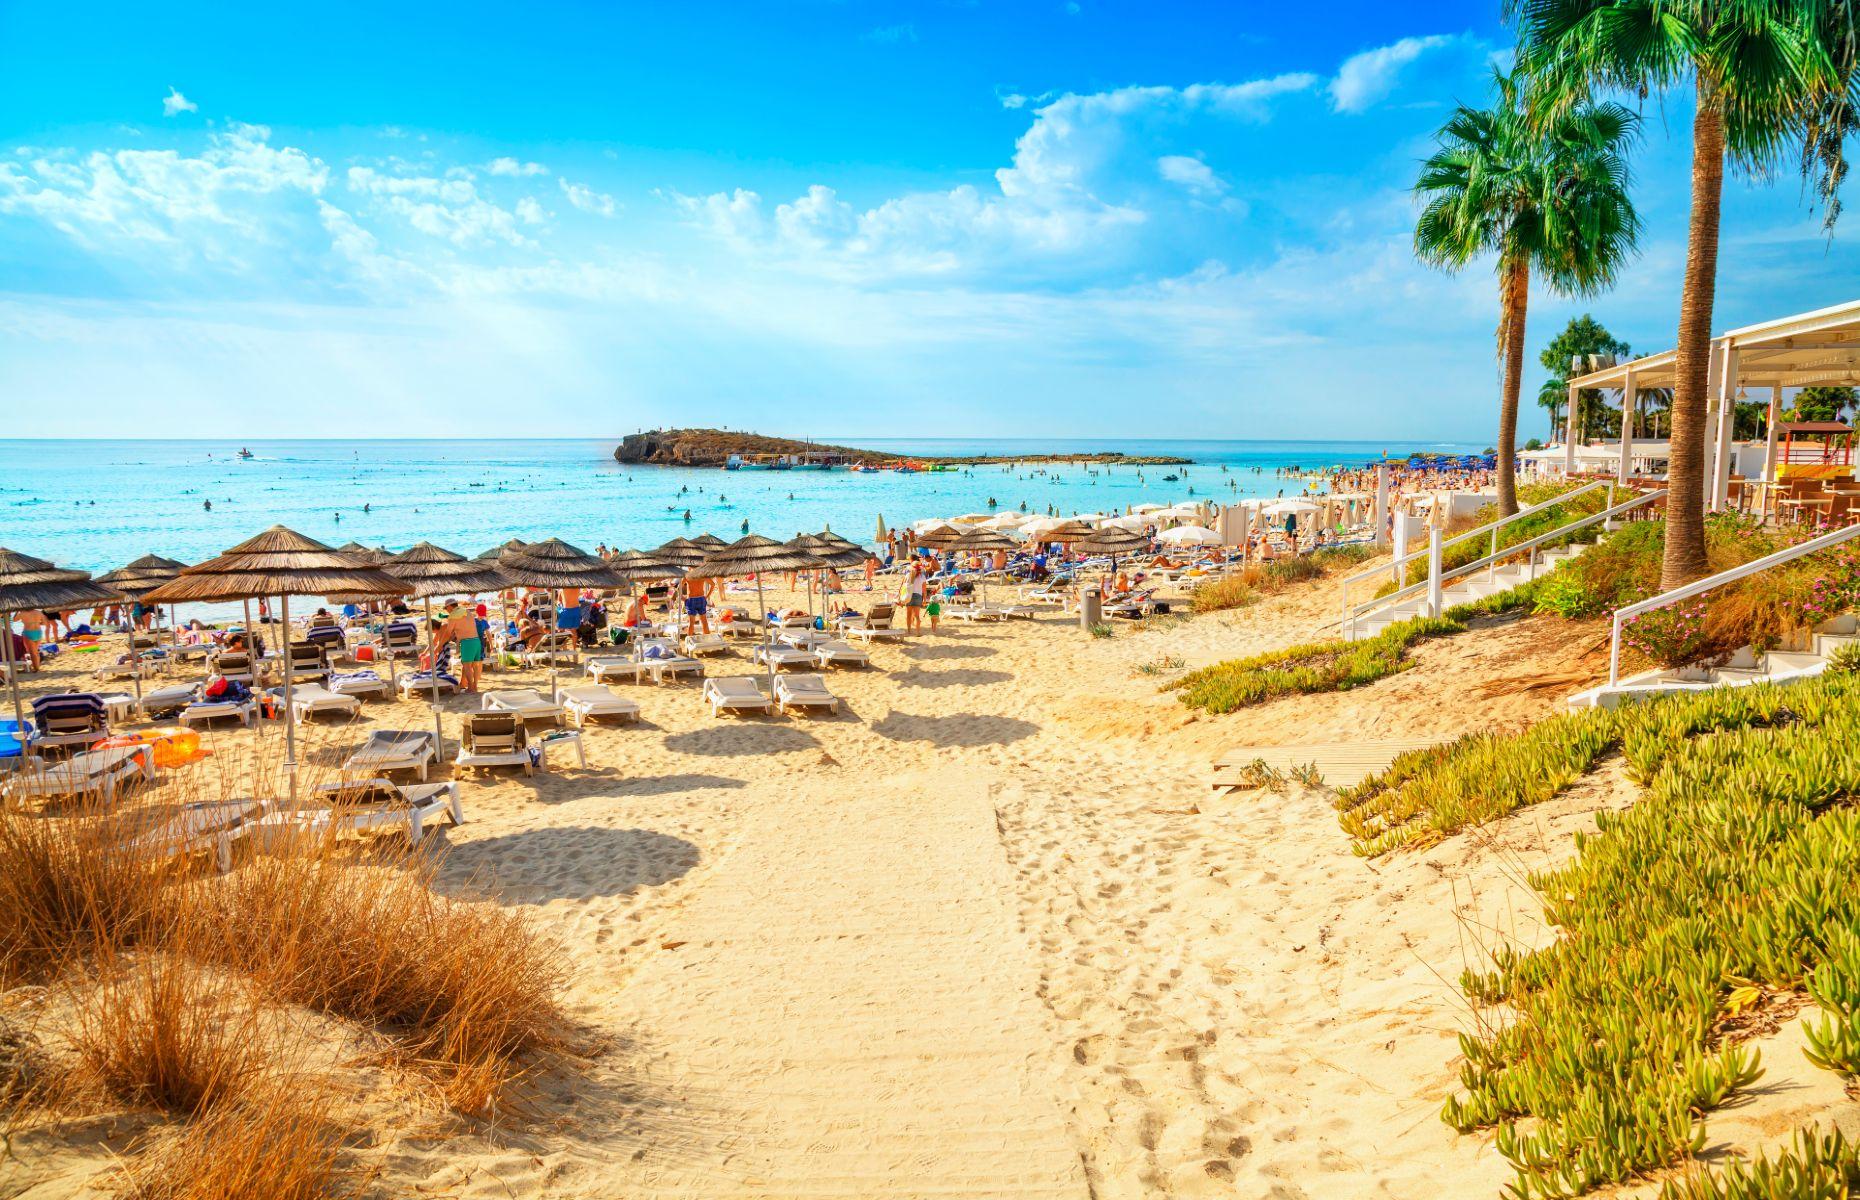 Ayia Napa coastline in Cyprus (Image: Vladimir Sazonov/Shutterstock)